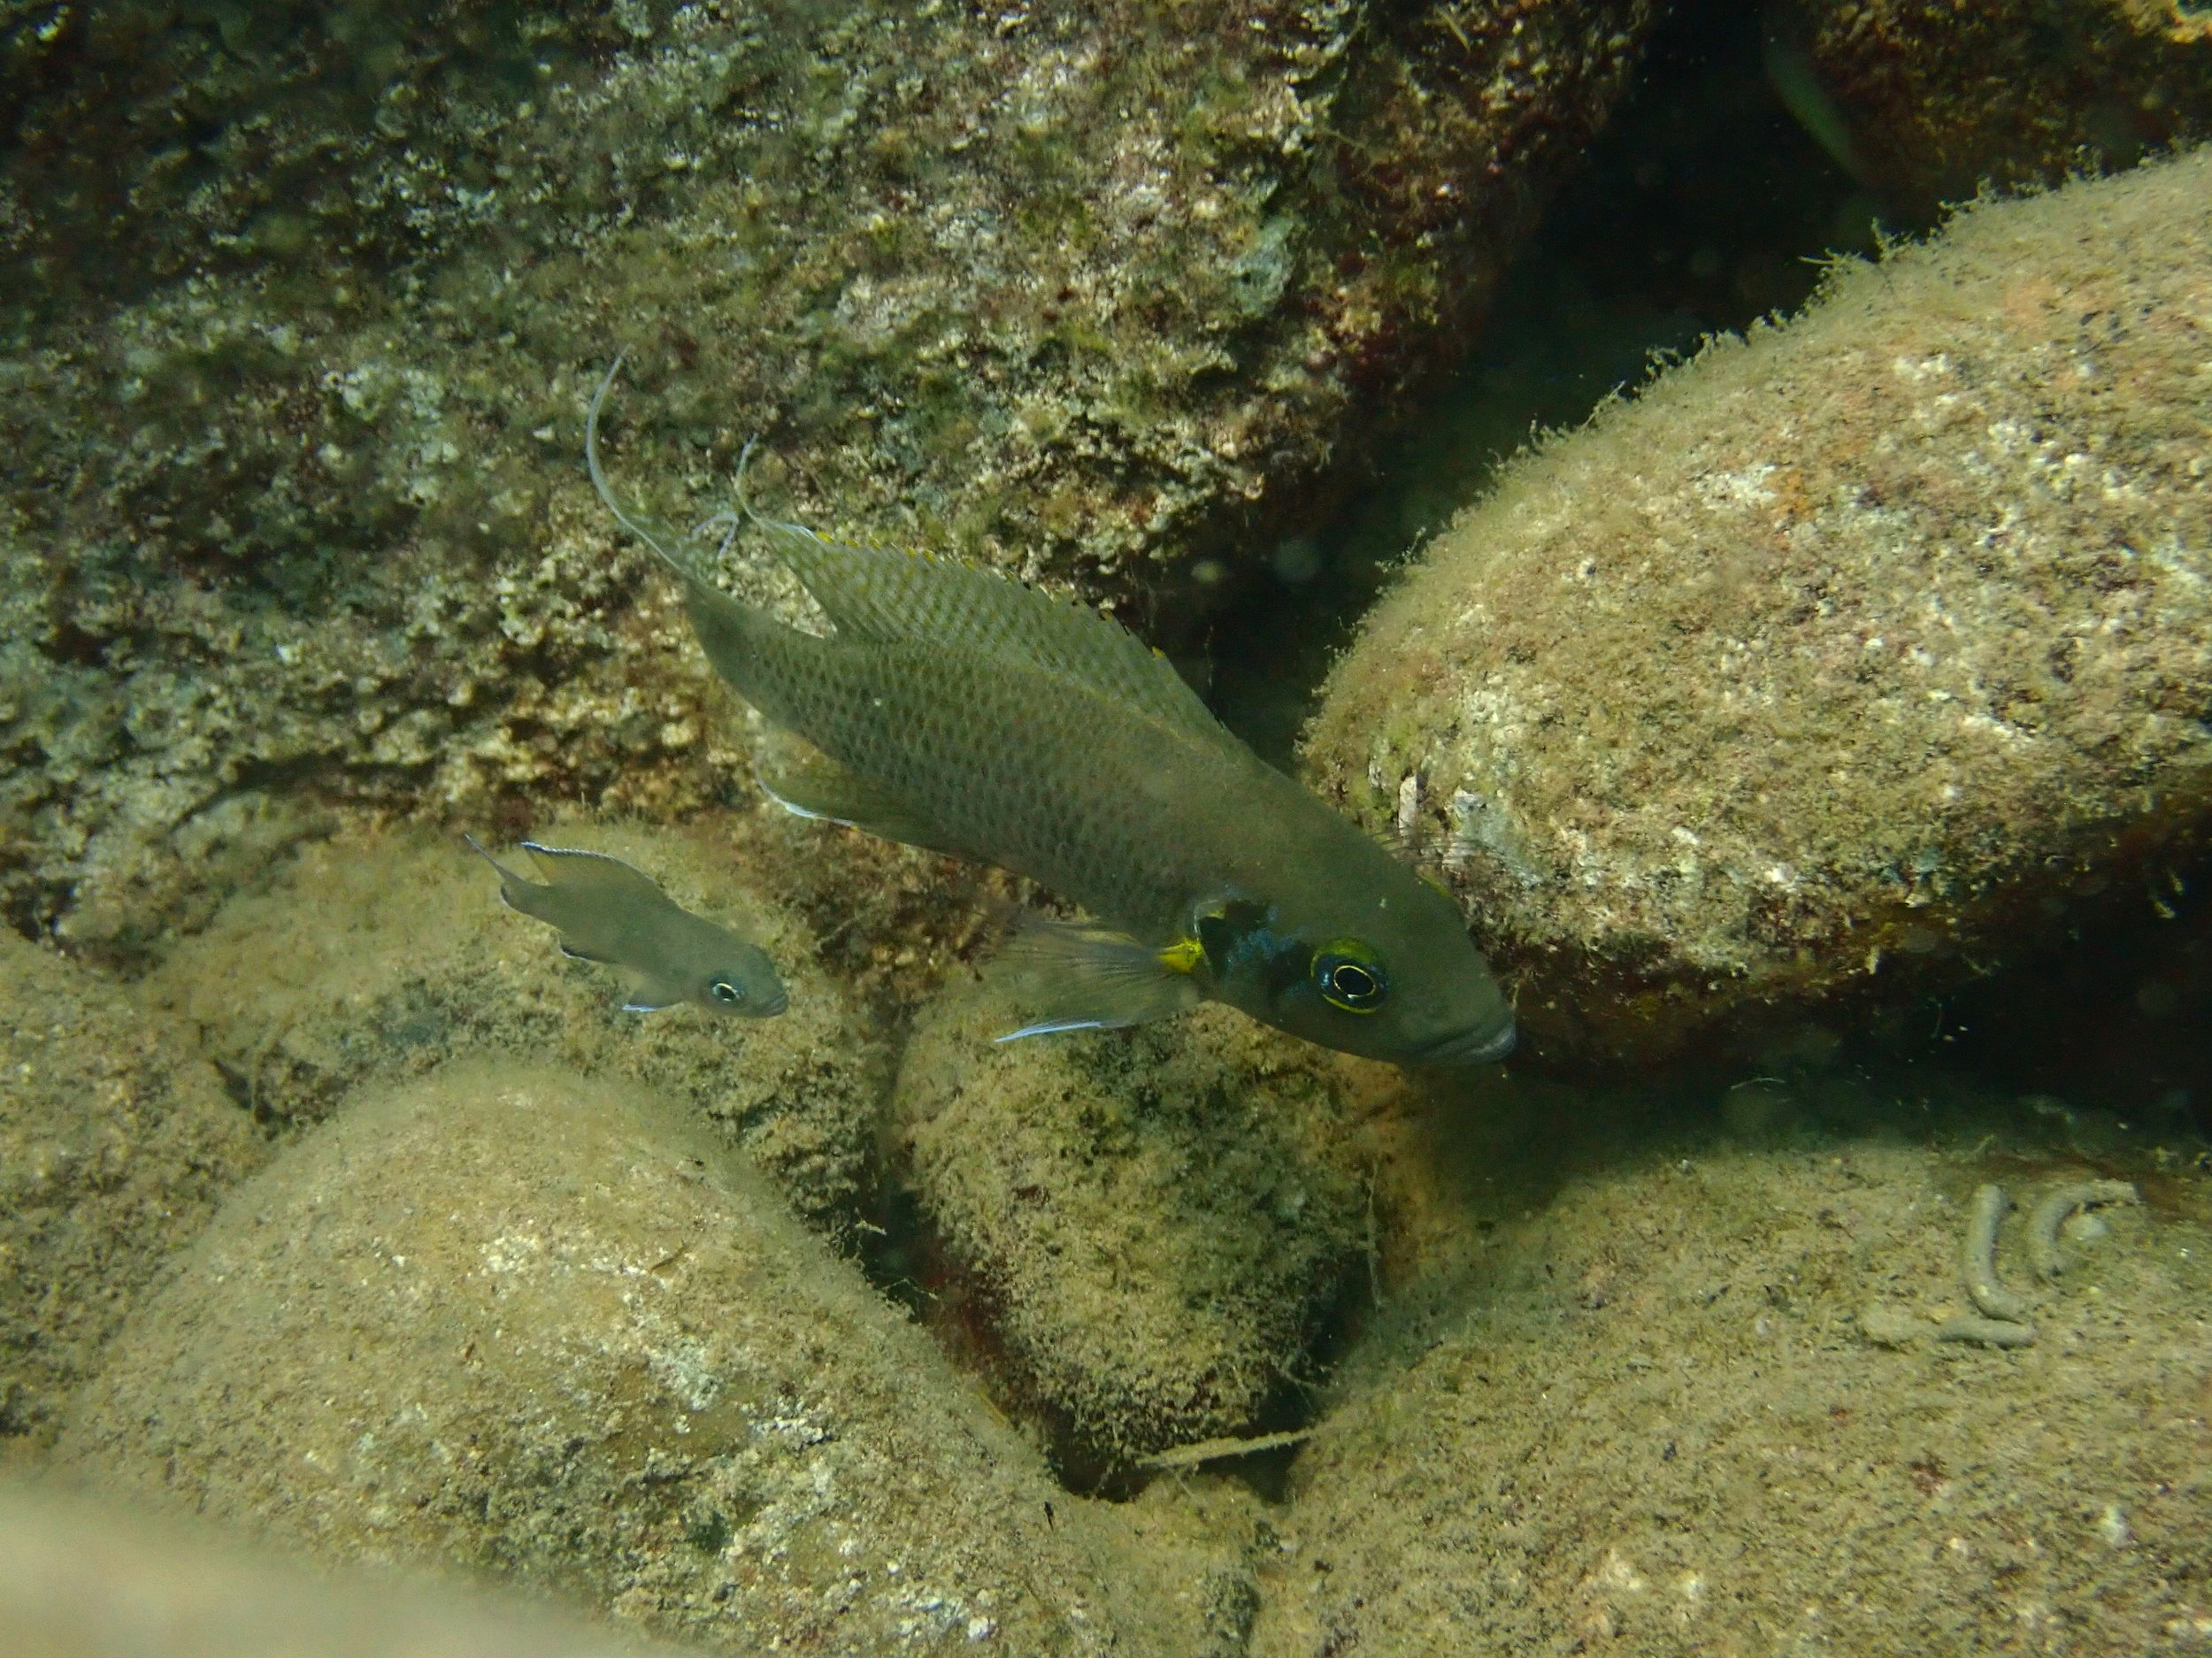 Neolamprologus pulcher in Lake Tanganyika, Zambia (photo credit: Aneesh Bose)